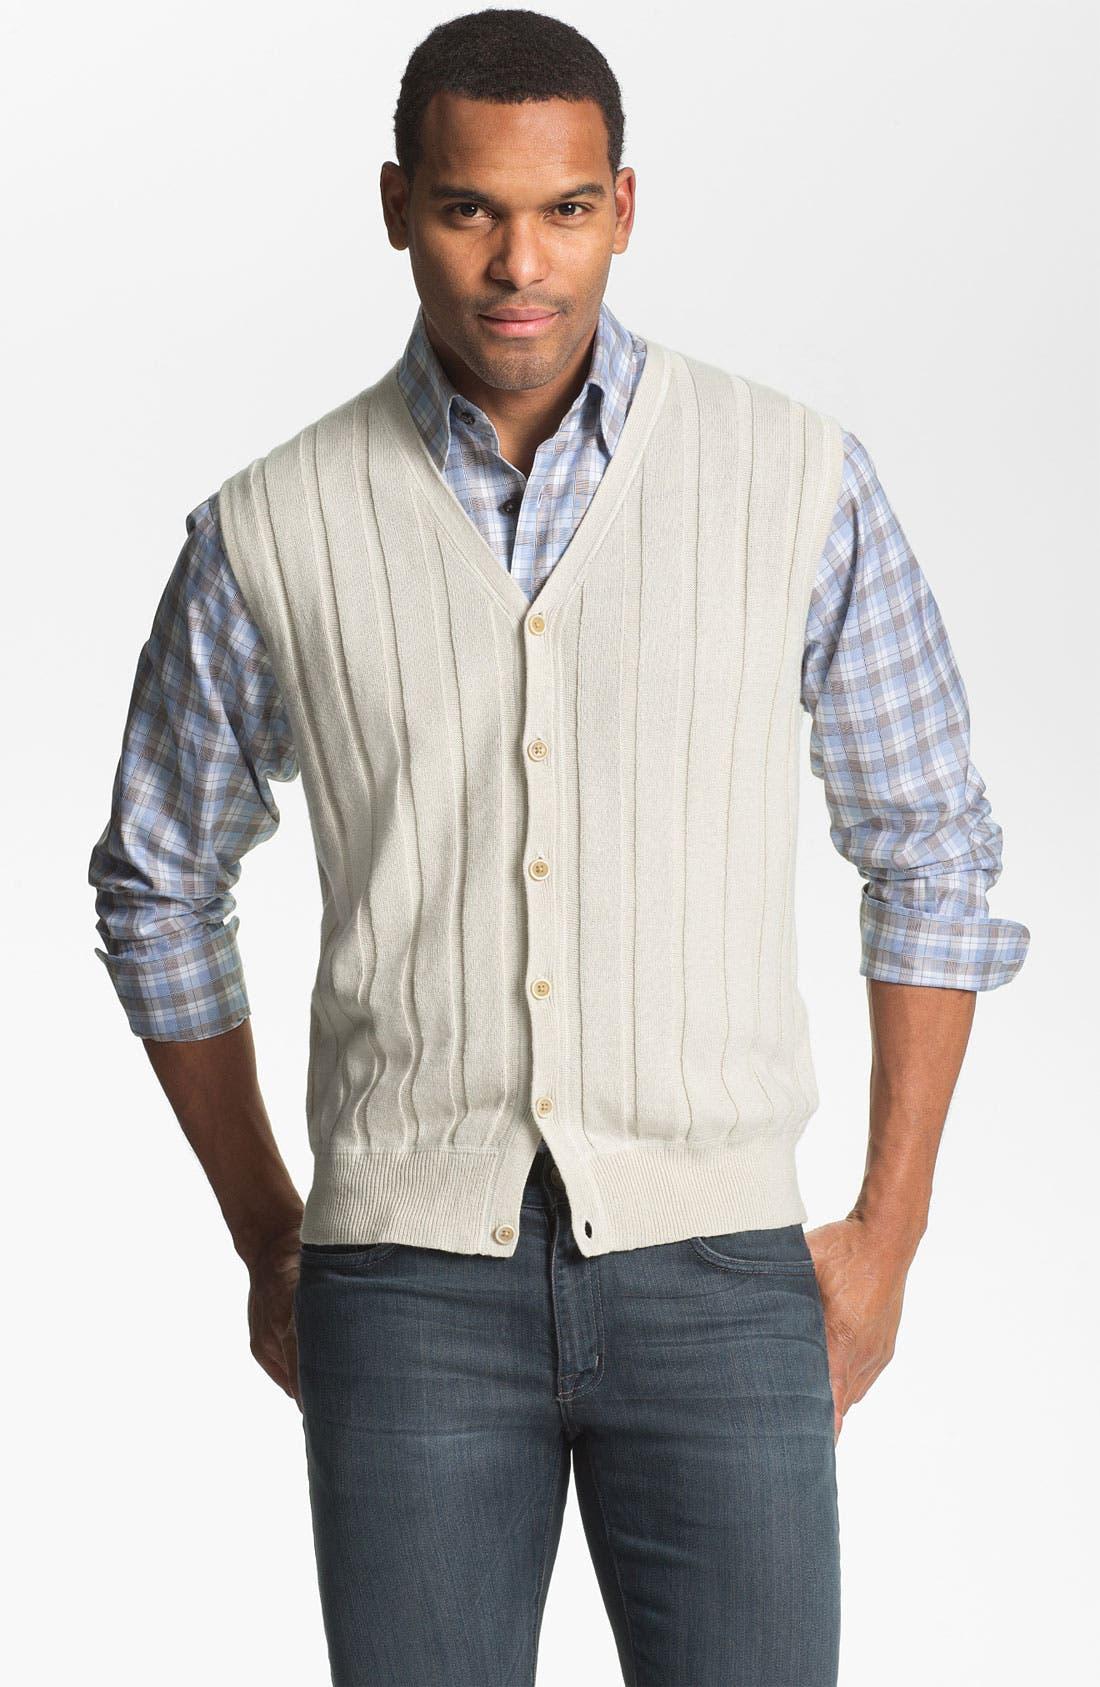 Alternate Image 1 Selected - Robert Talbott Linen & Cotton Sweater Vest